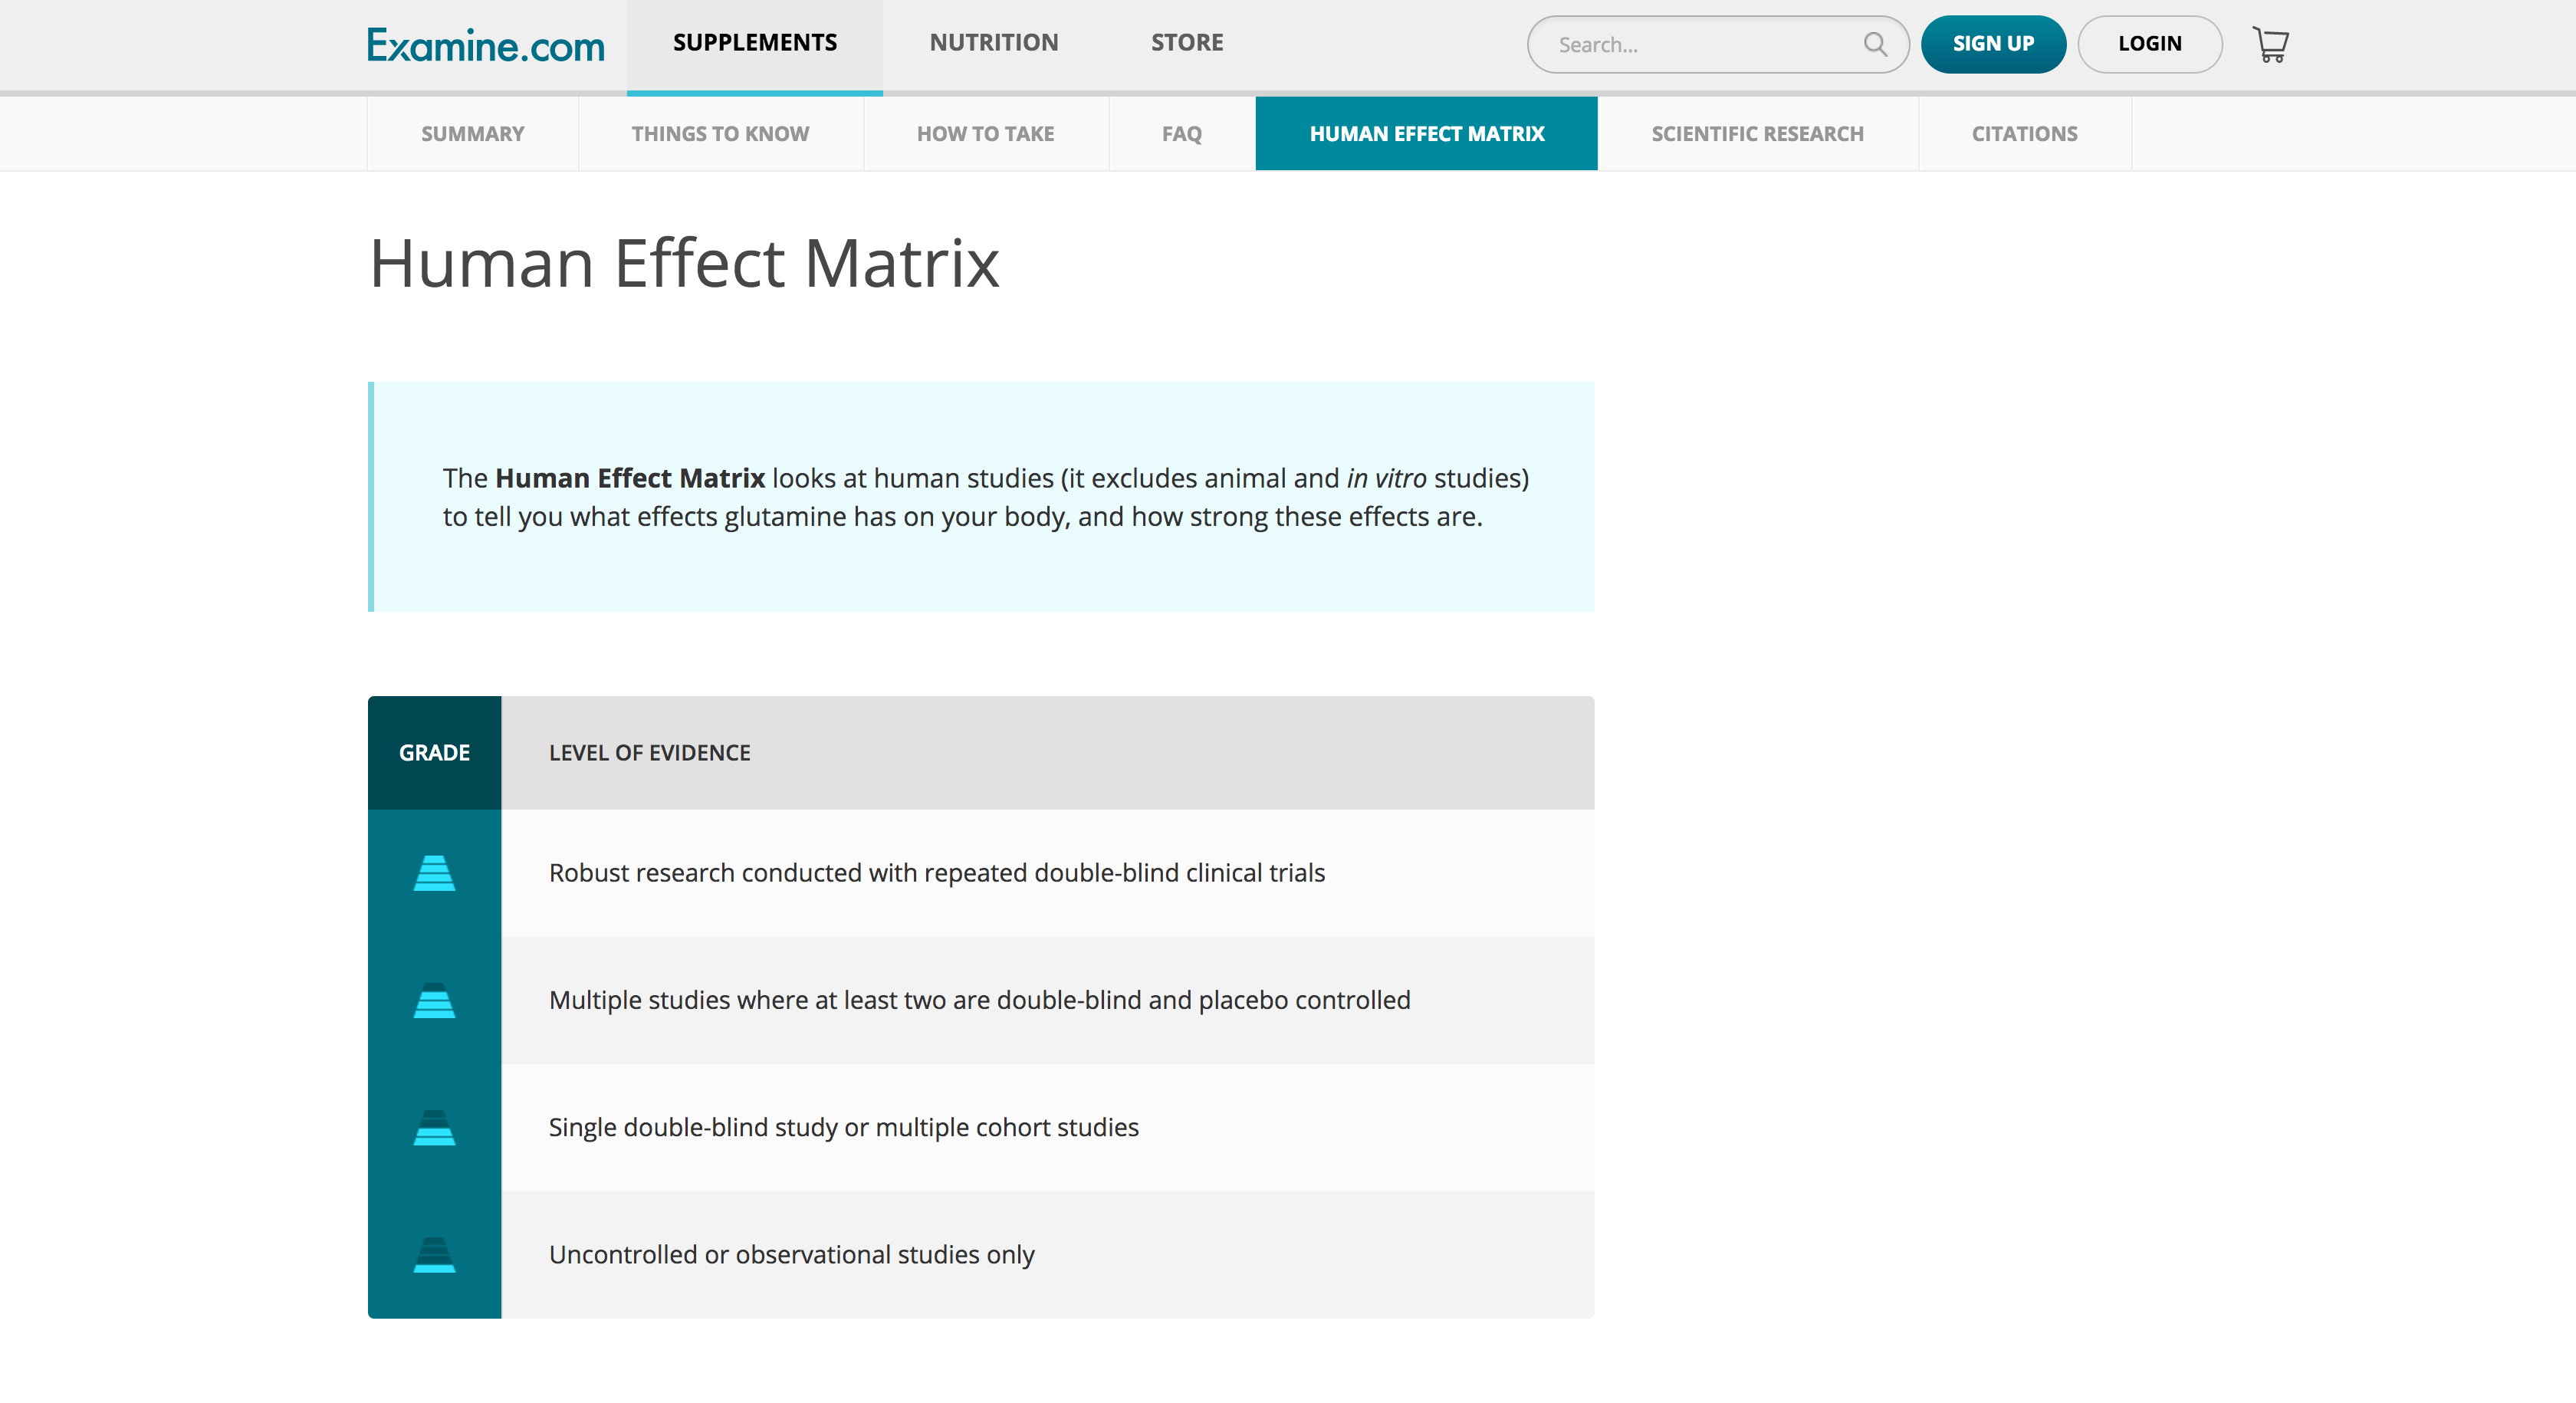 Human Effect Matrix